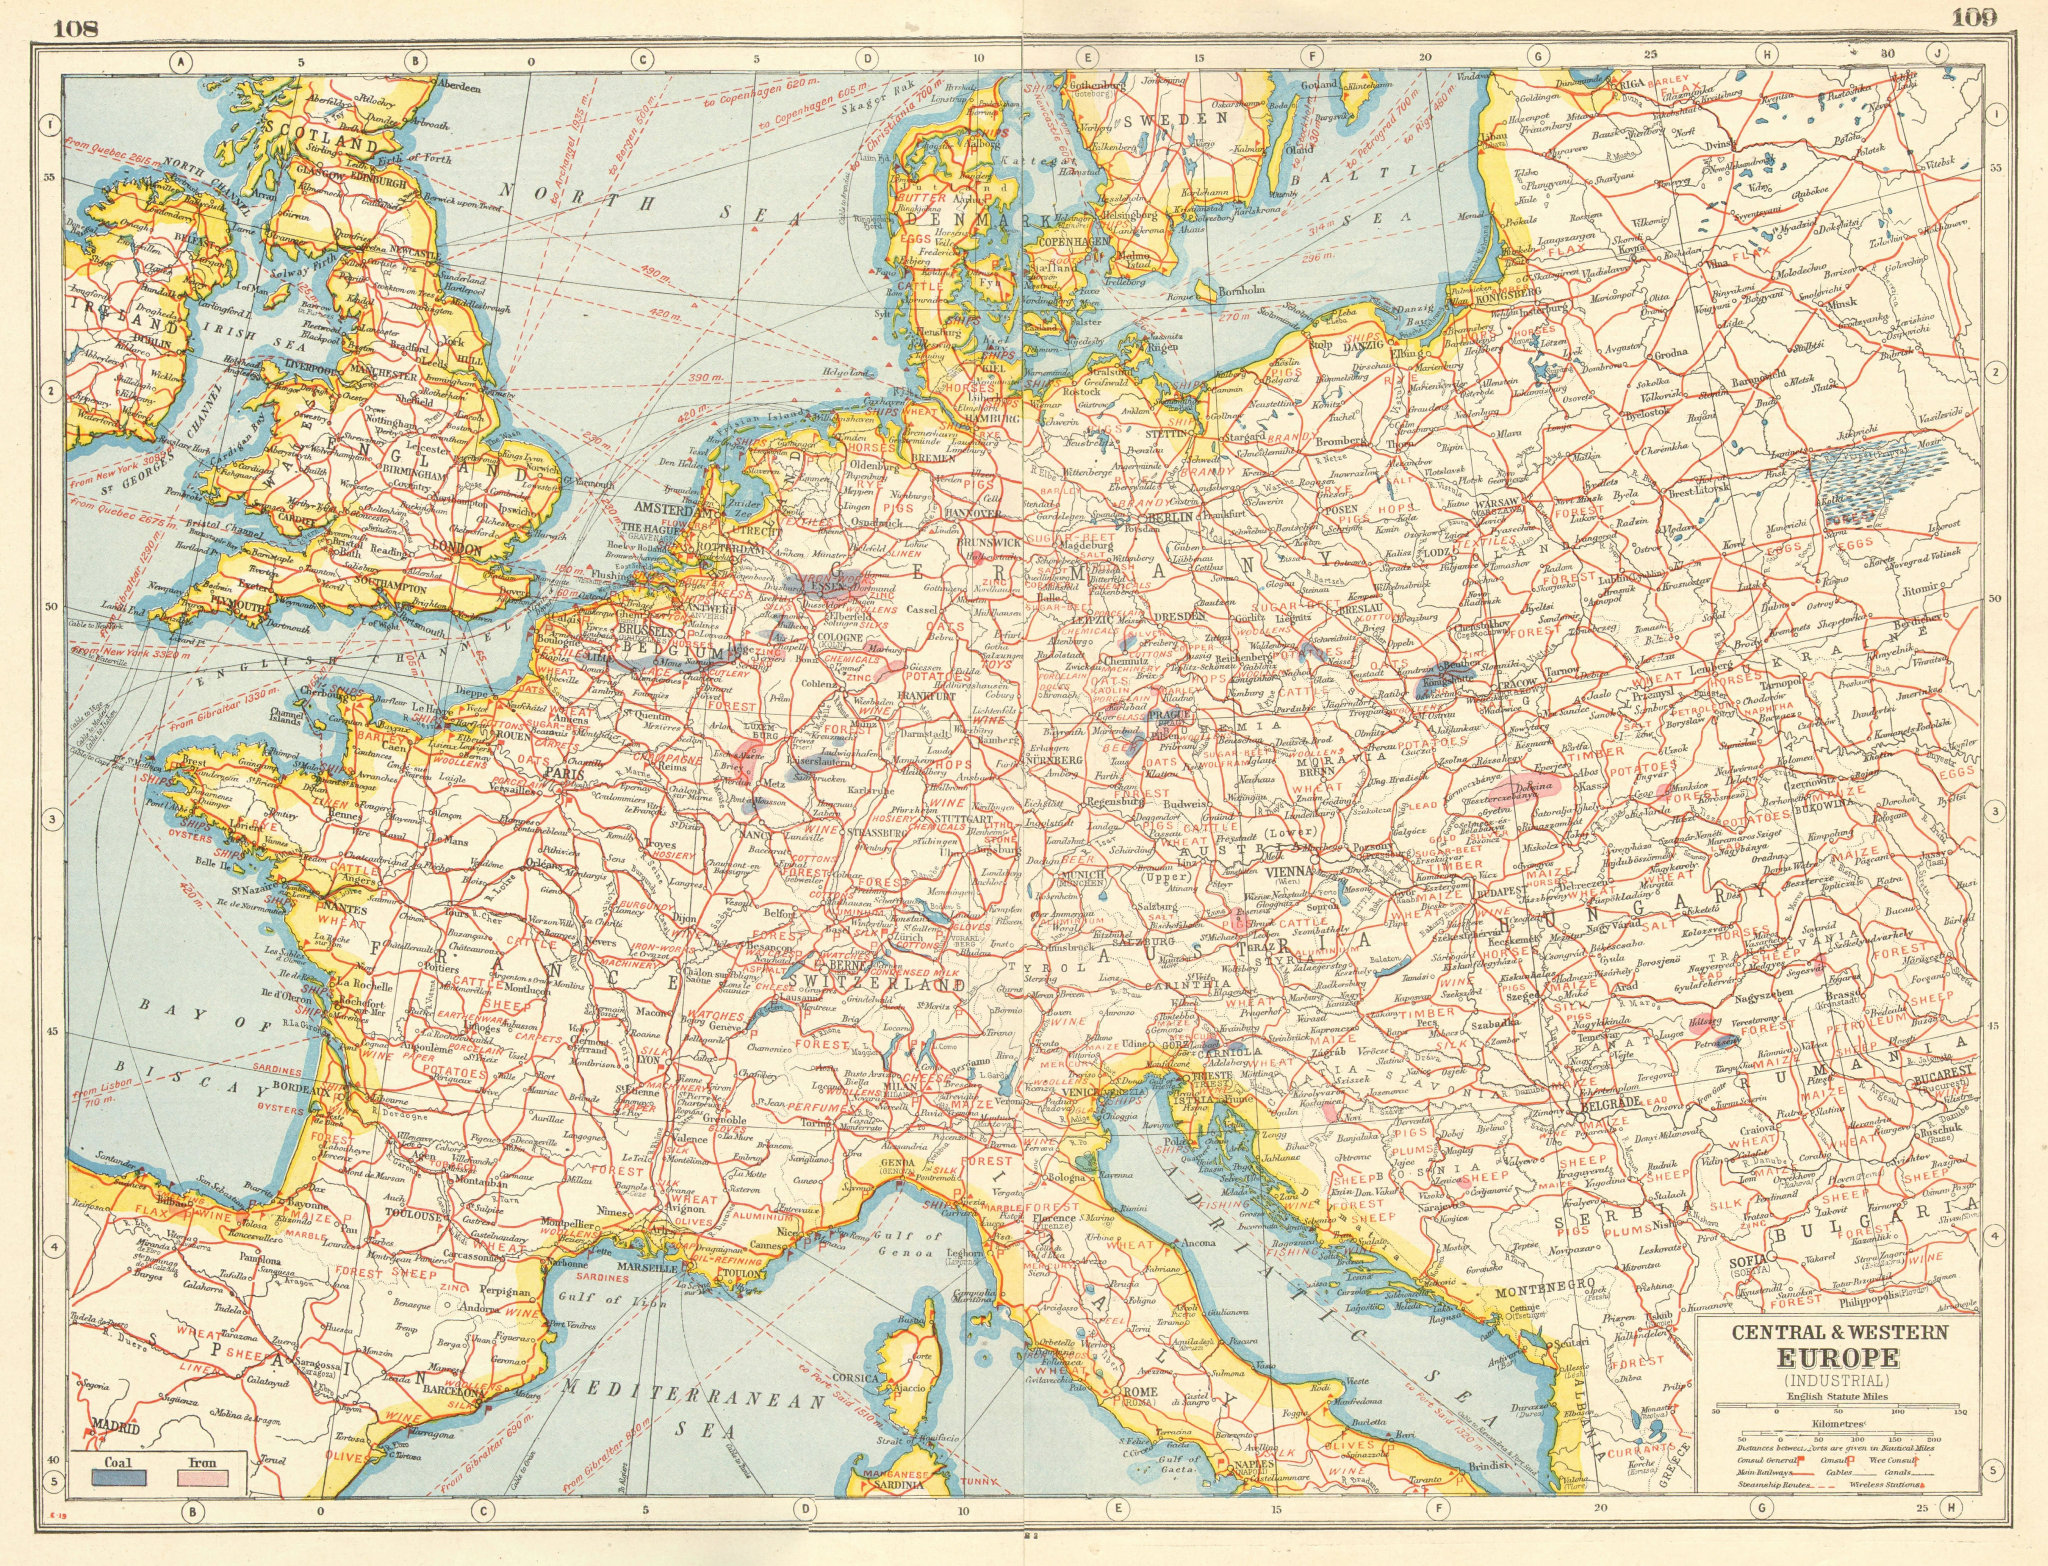 Associate Product EUROPE. INDUSTRIES. Coal & Iron deposits. British consuls. Railways 1920 map